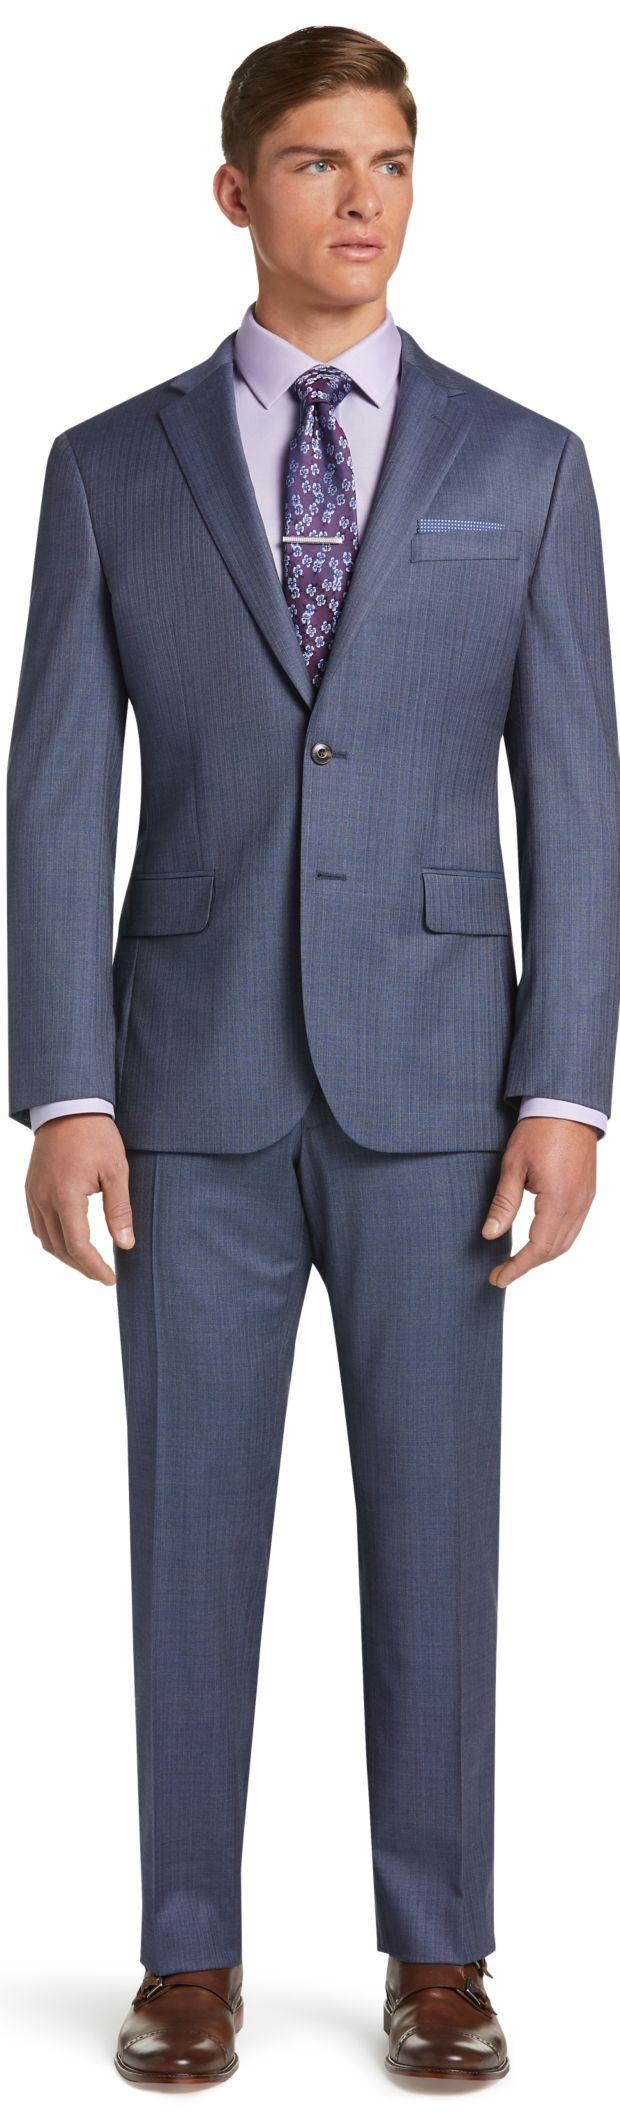 1905 Collection Herringbone Slim Fit Suit with brrr comfort